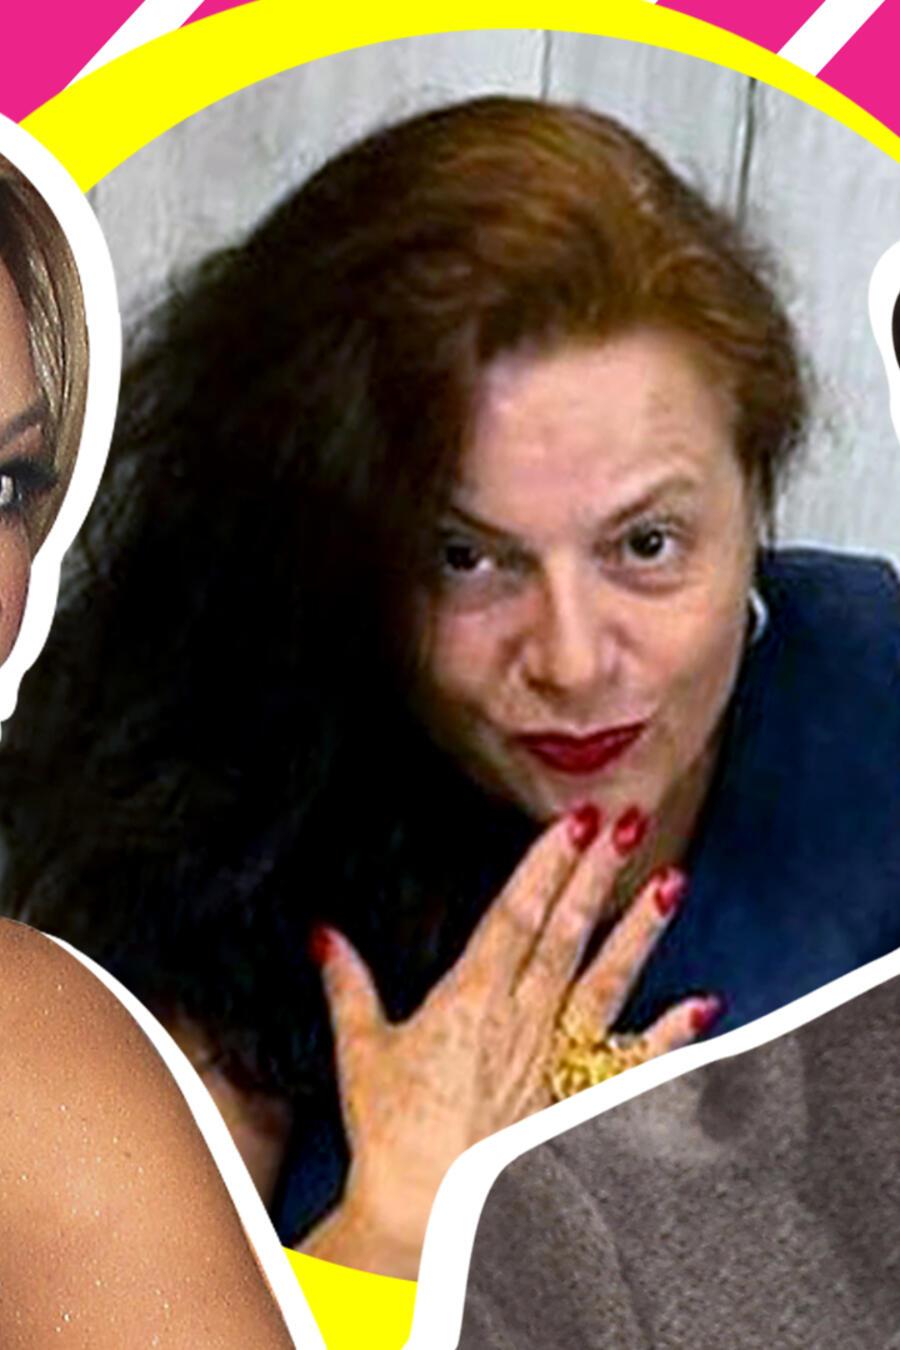 Hermana de Julián Gil vs Marjorie de Sousa descarada